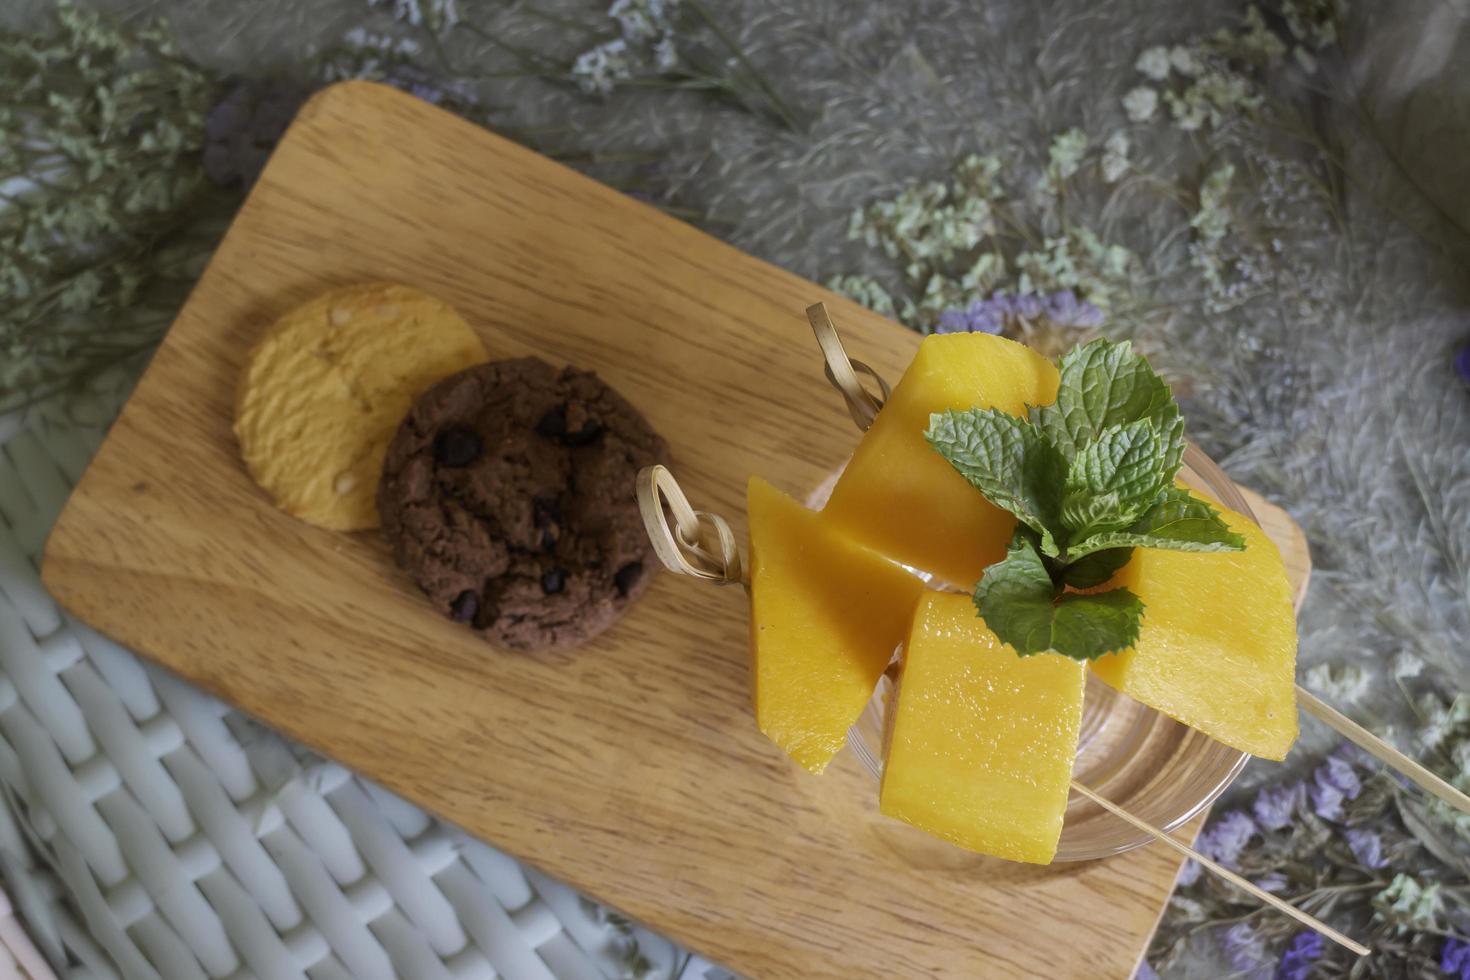 gul mangofrukt och kakor foto